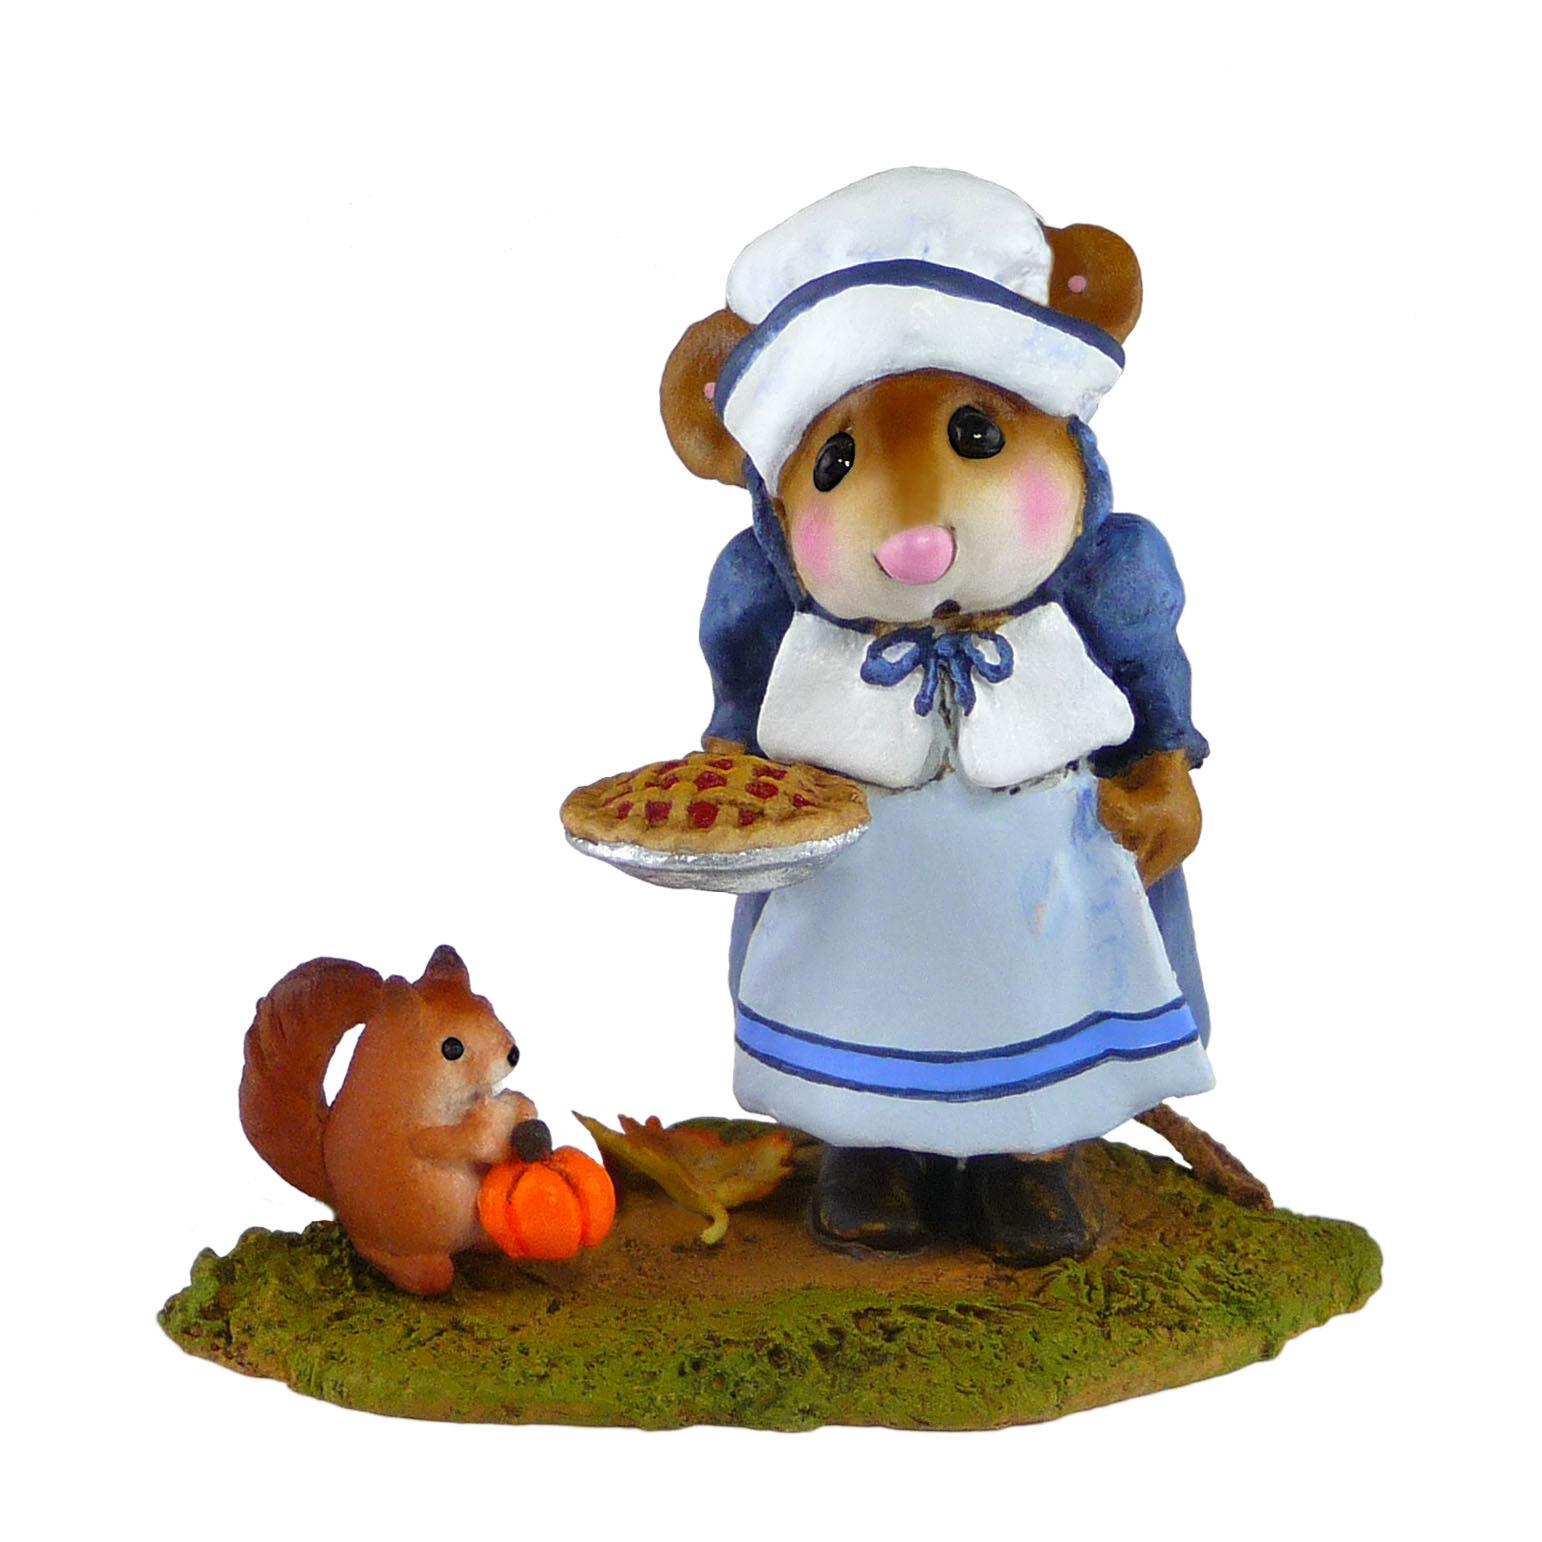 Wee Forest Folk Folk Folk Miniature Figurine M-496 - Wee Pumpkin and Pie 10458b